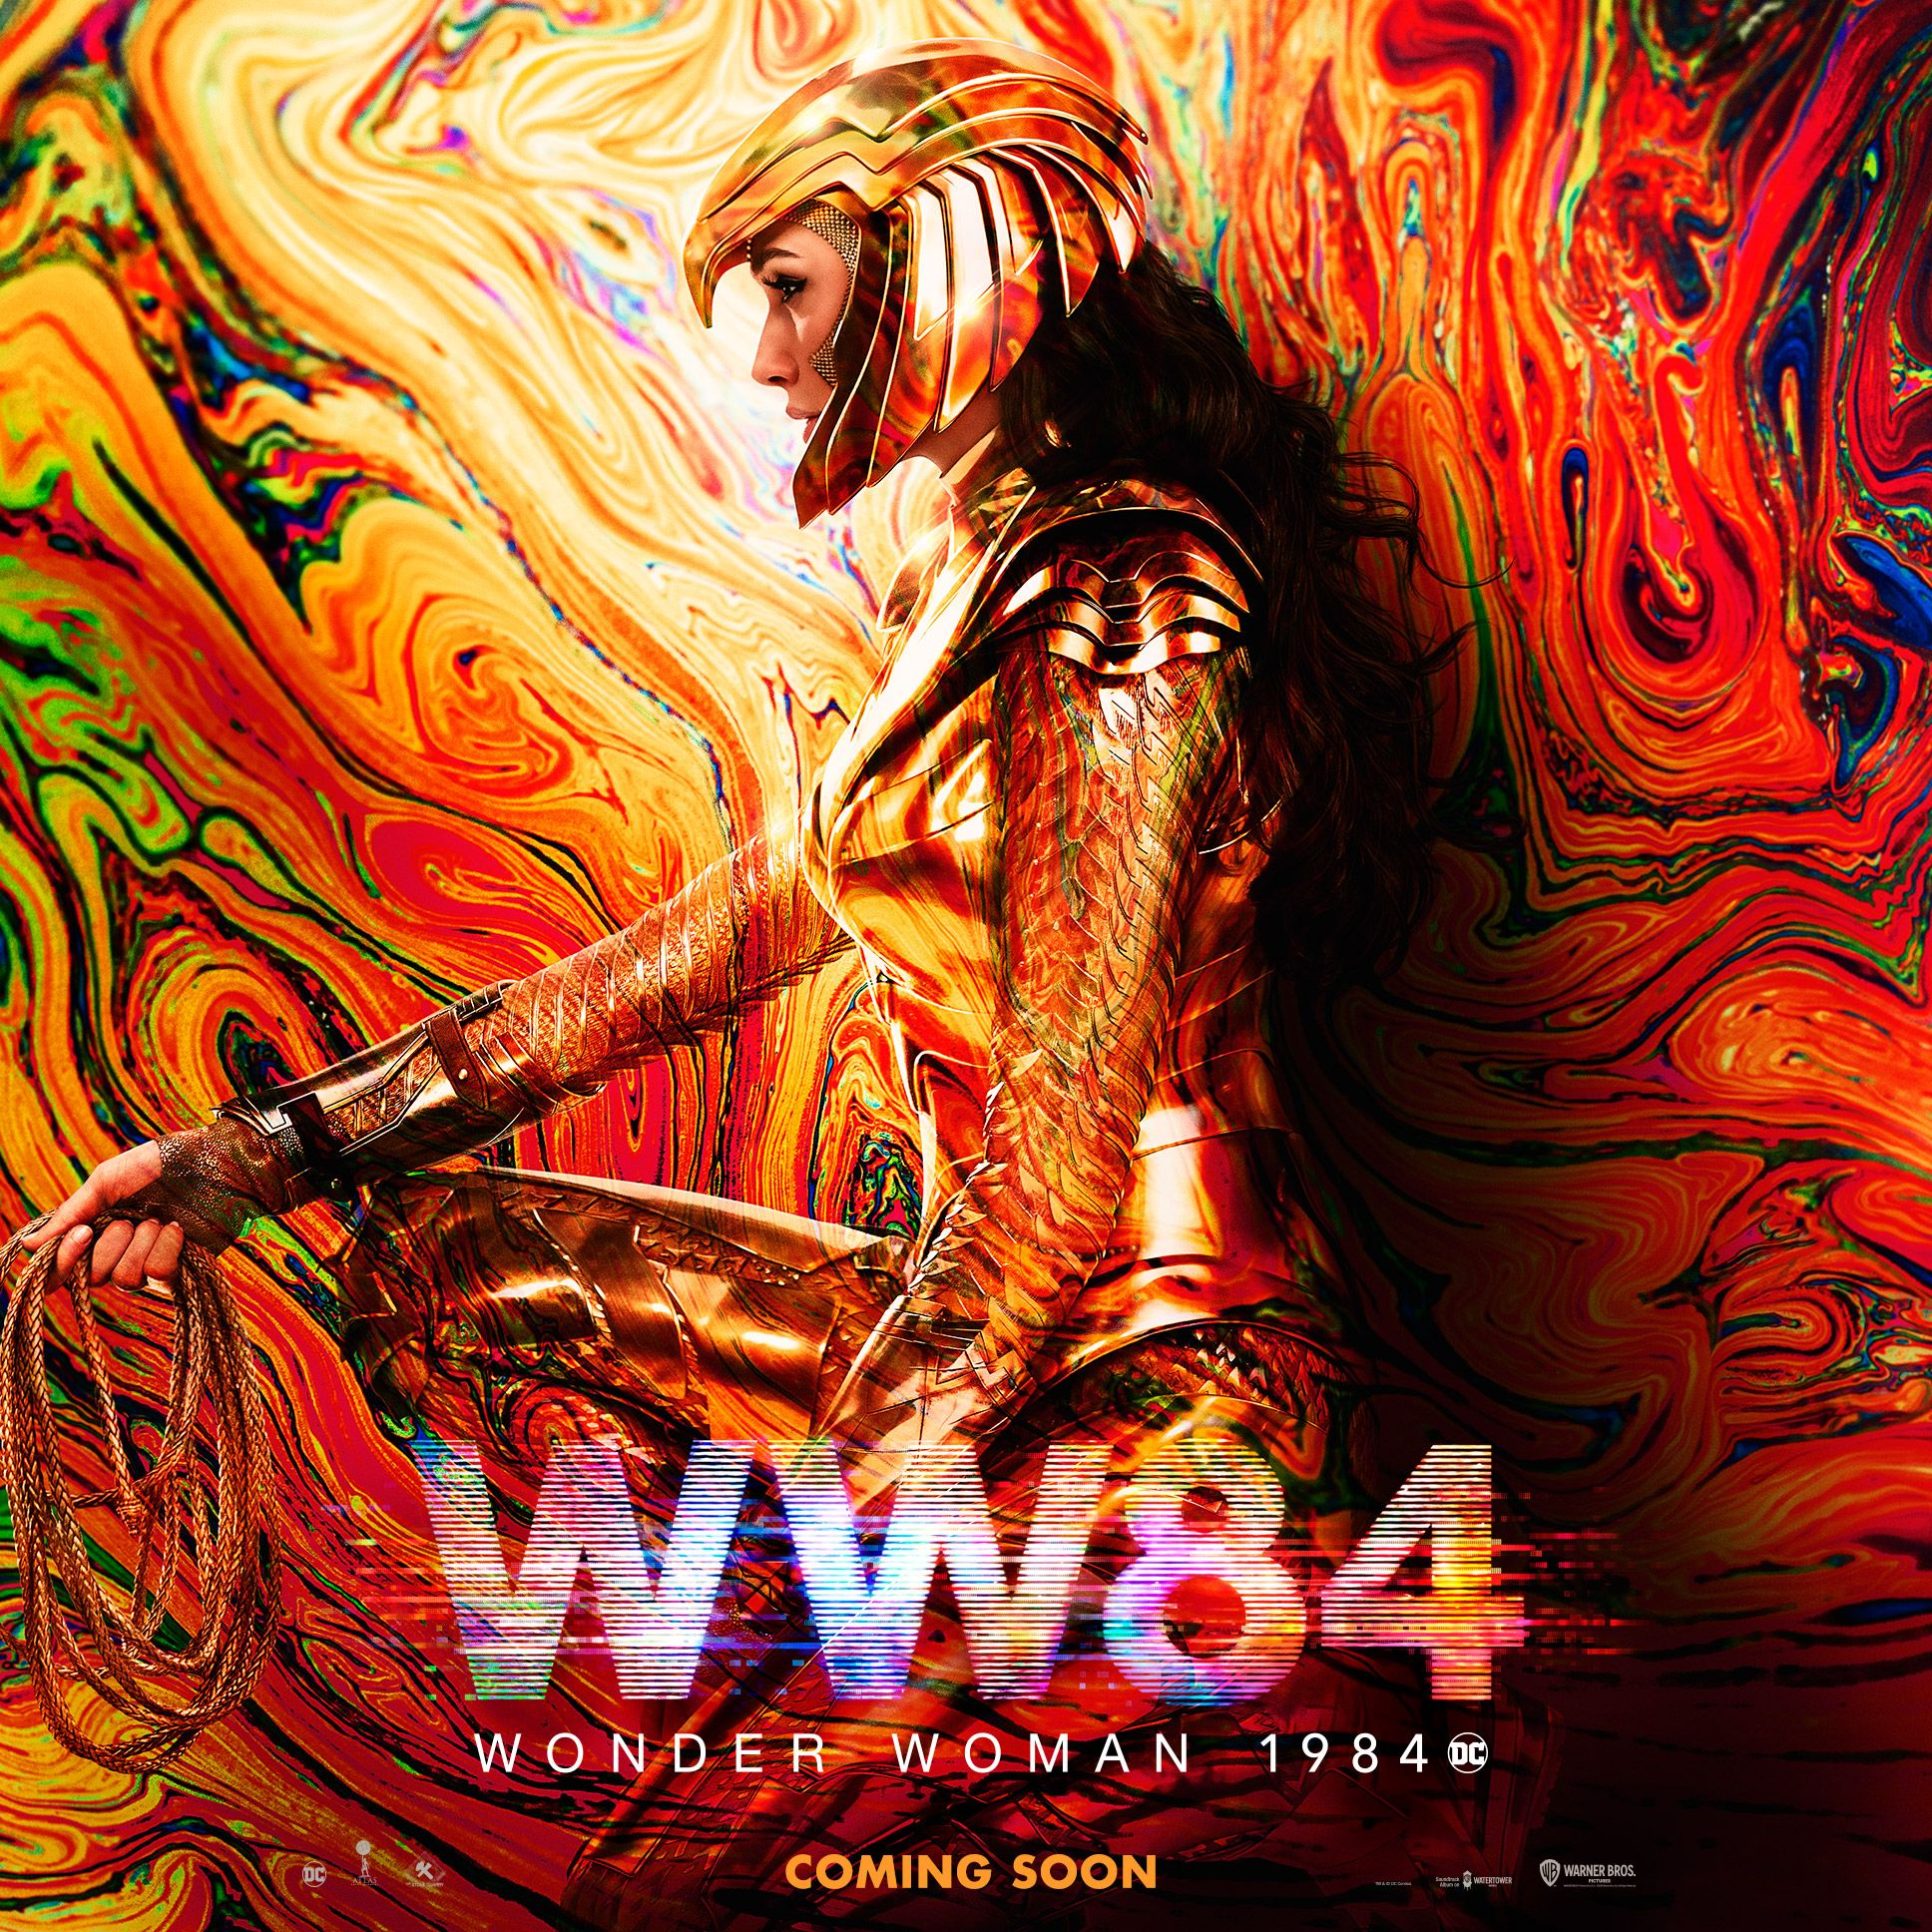 Wonder Woman Uk On Twitter In 2020 Wonder Woman Gal Gadot 1984 Movie